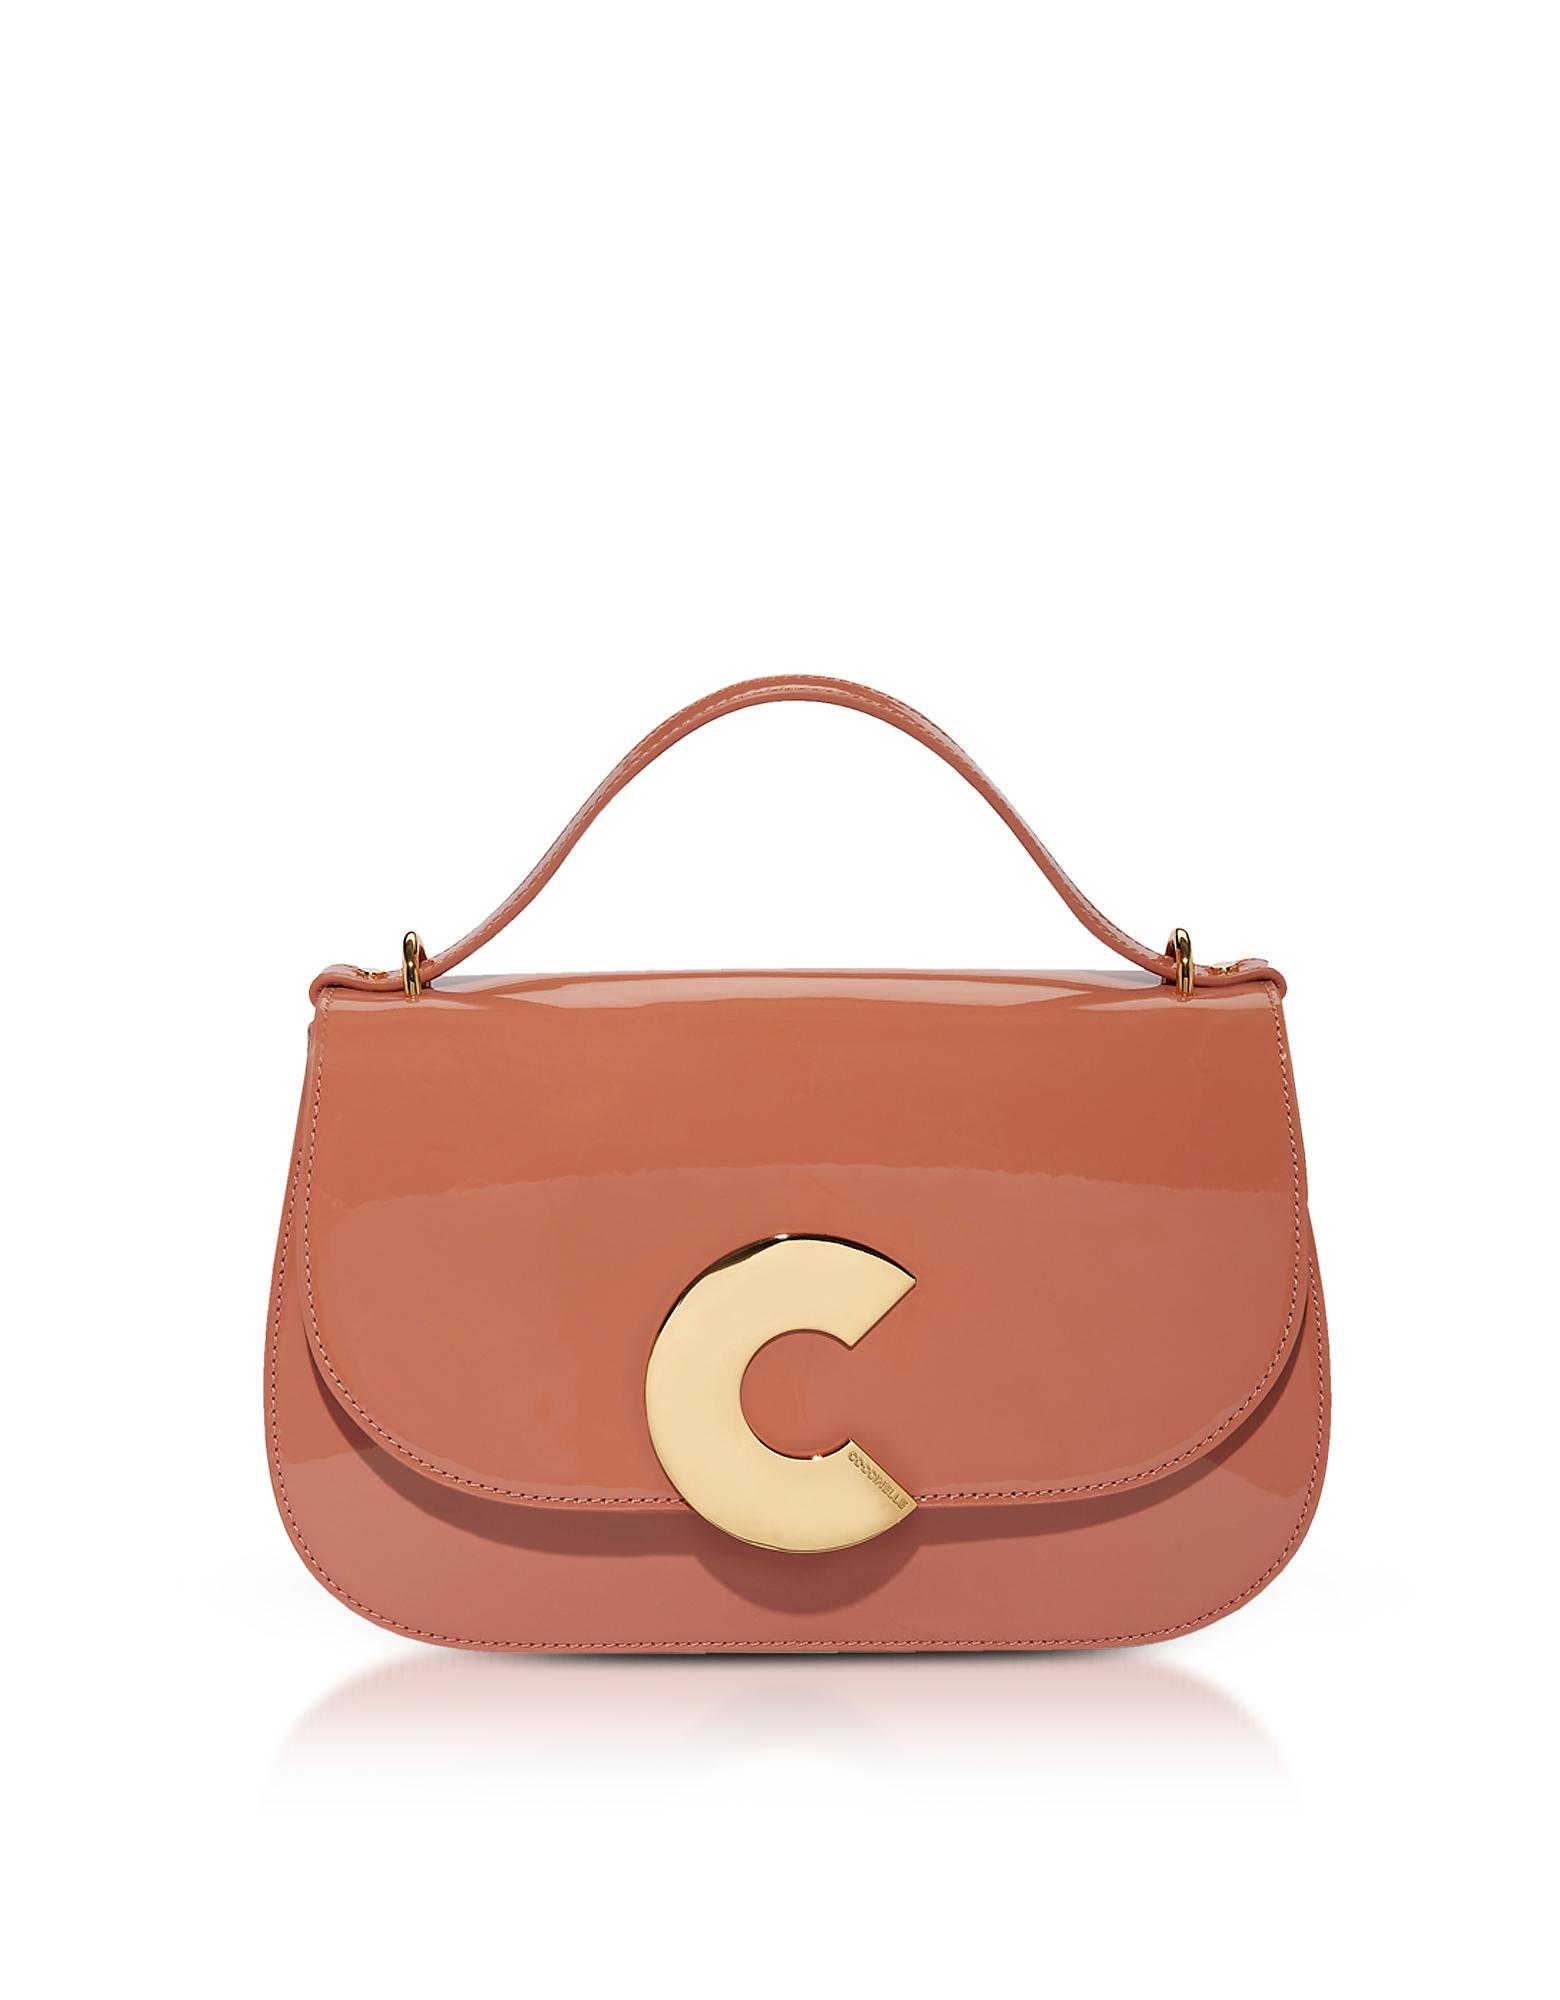 Image of Coccinelle Designer Handbags, Craquante Patent Maxi Leather Satchel Bag